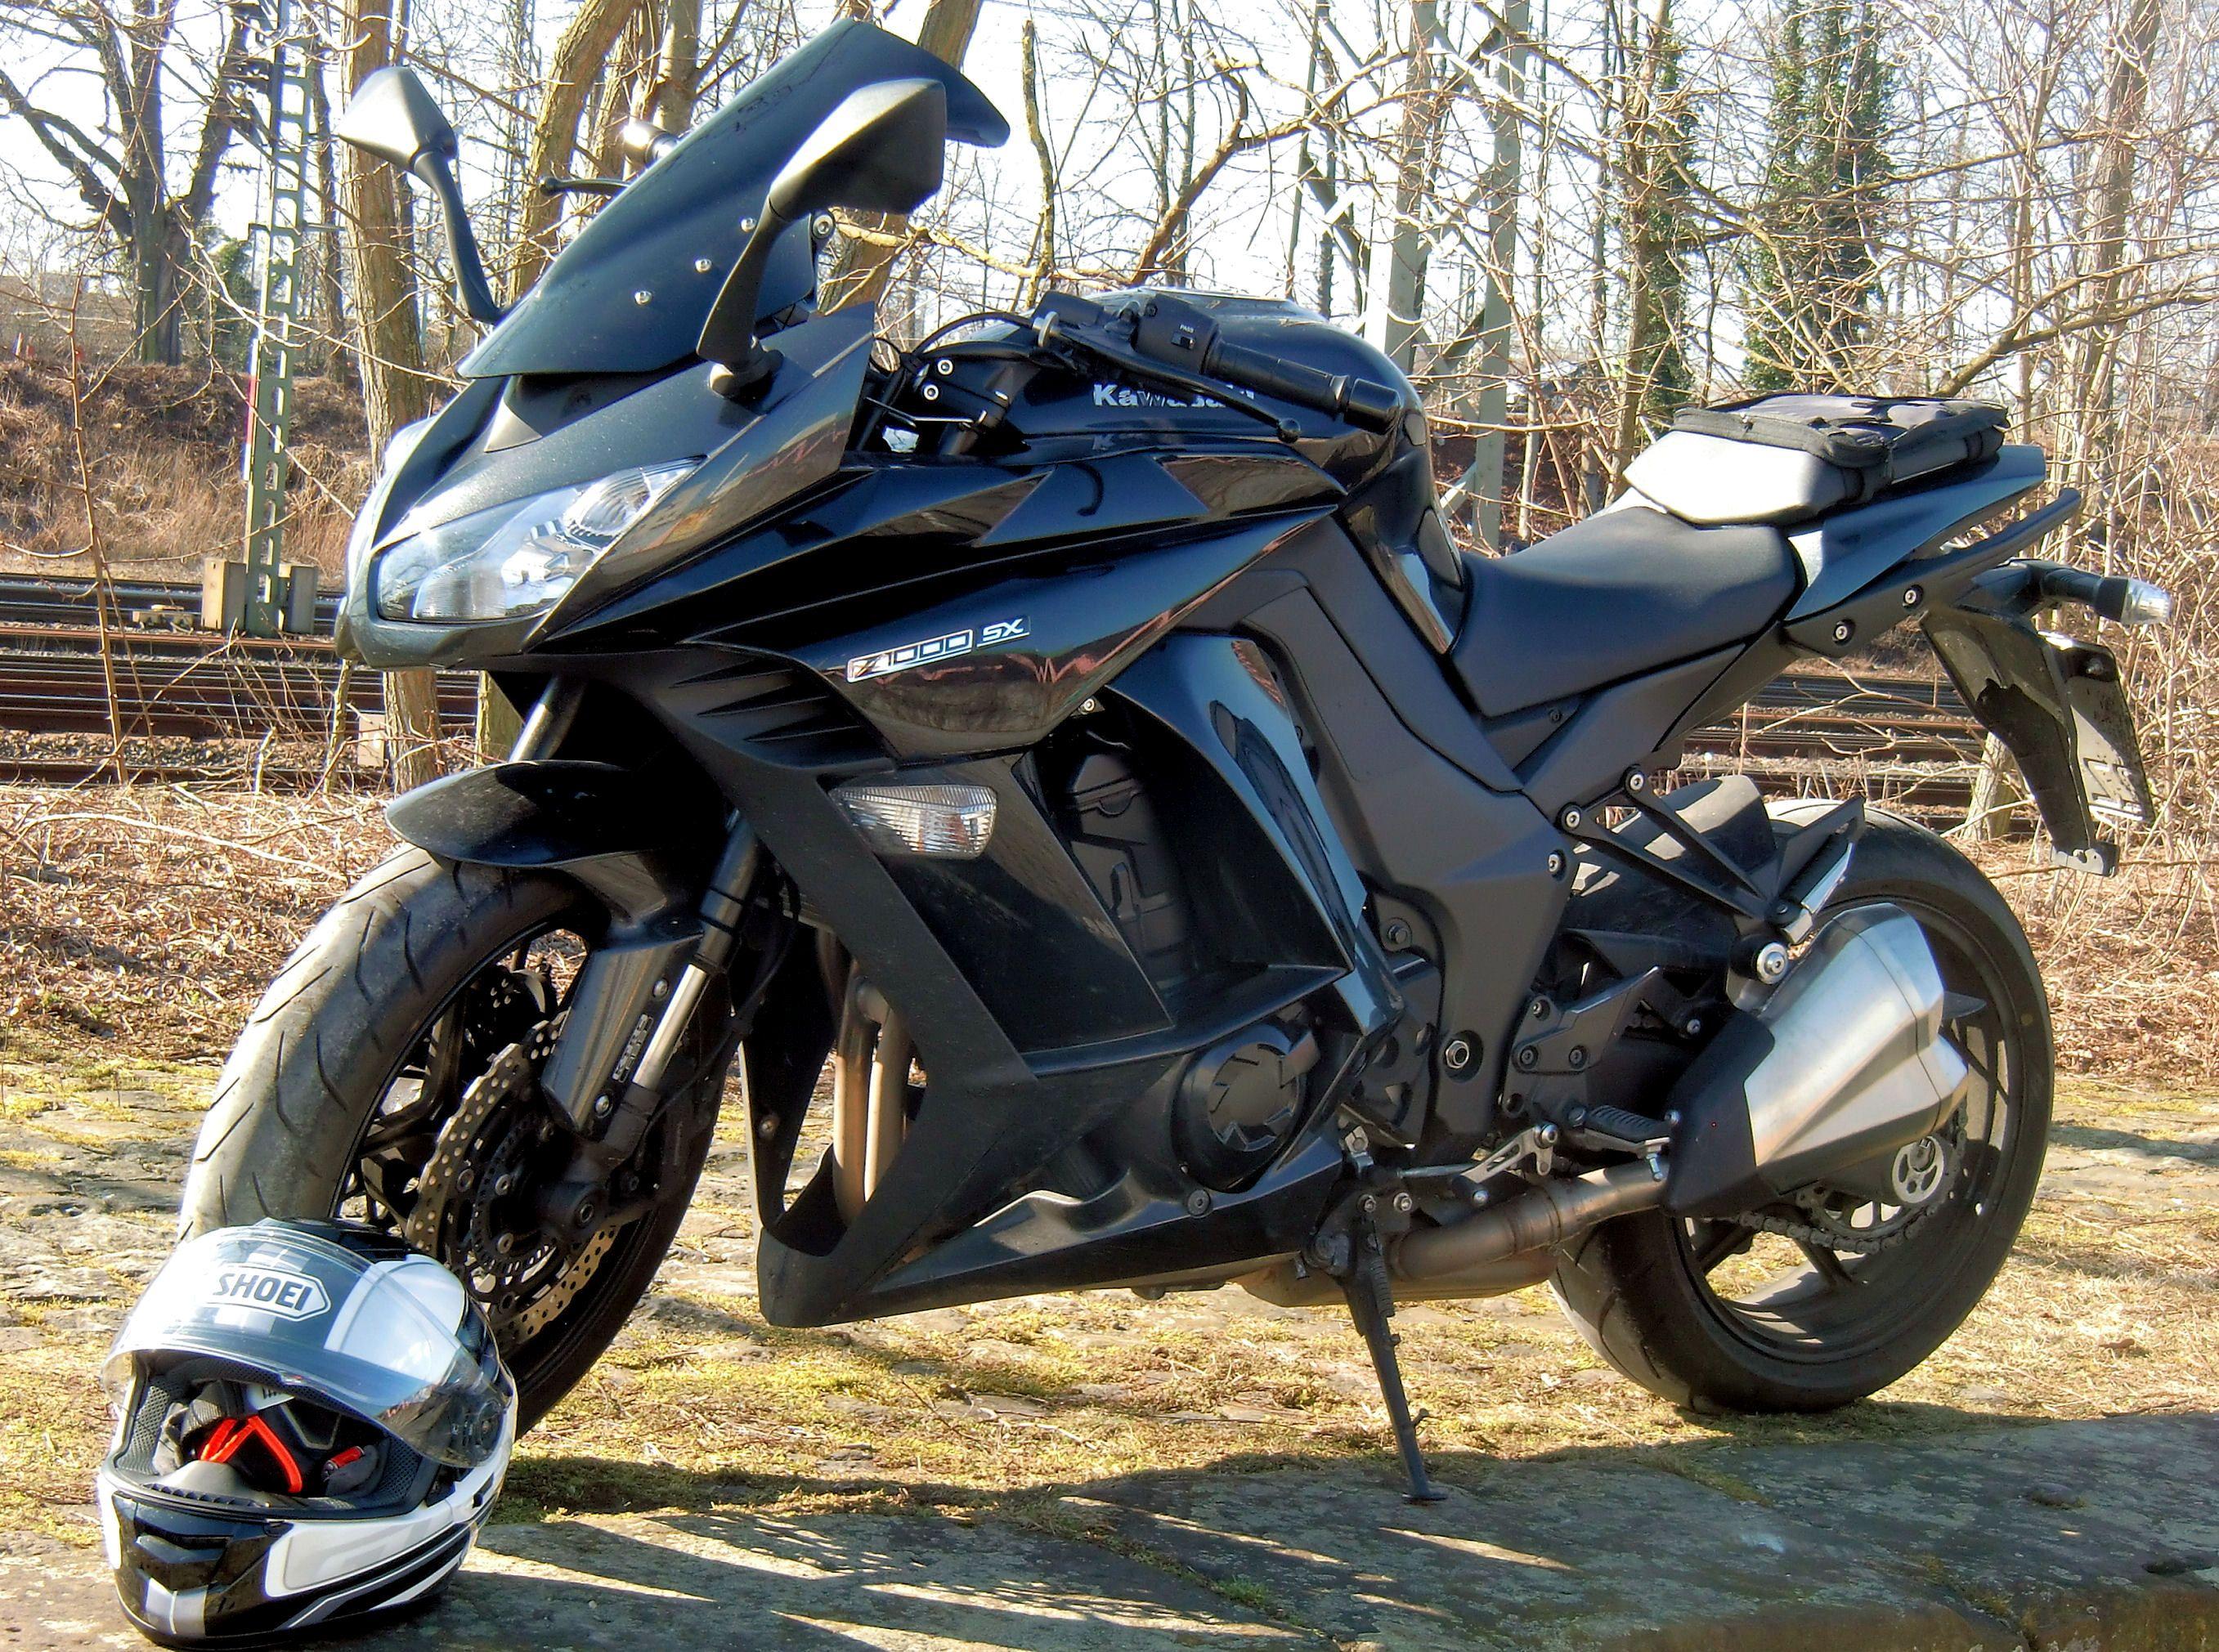 Motorrad Kawasaki Z1000sx Bikerlife Sporttourer Motorbike